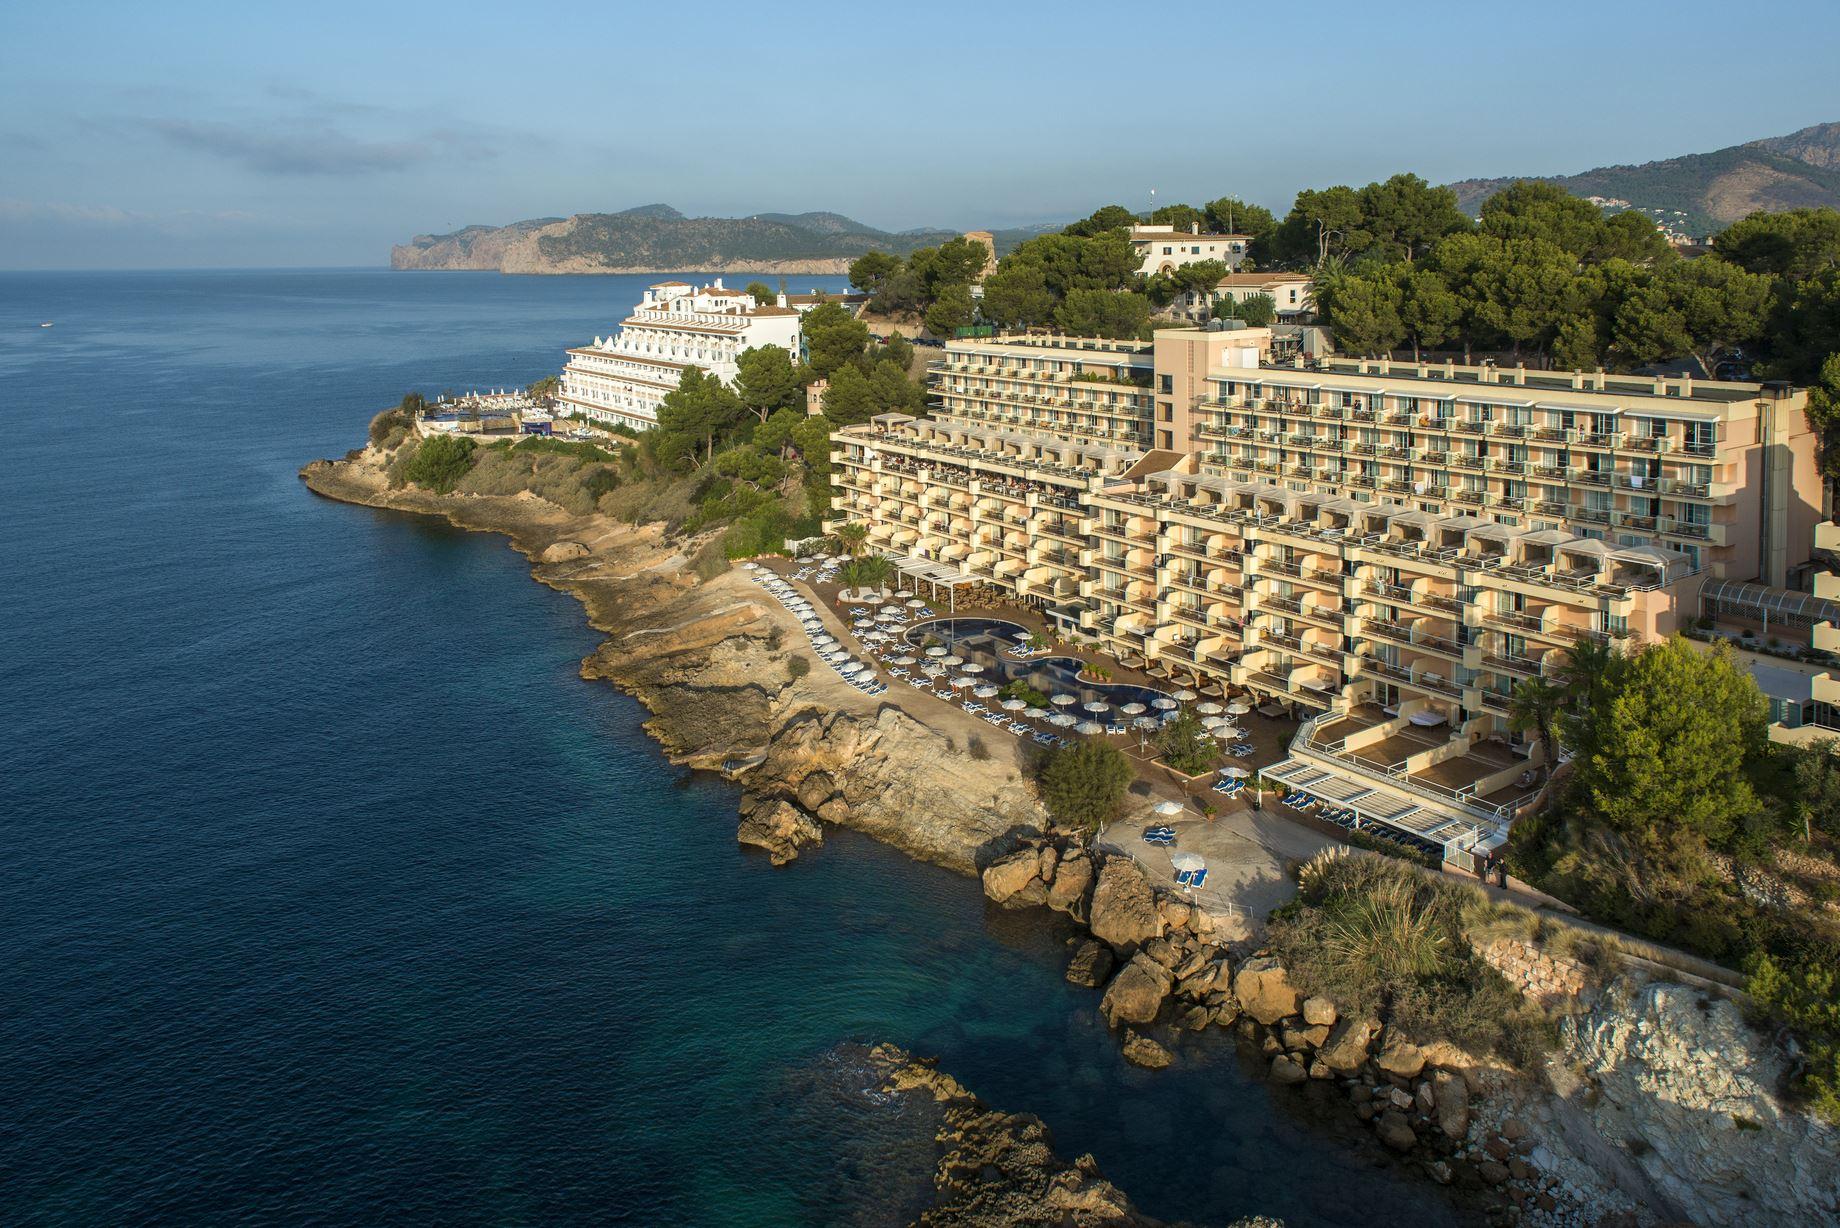 Iberostar Suite Hotel Jardin del Sol, Santa Ponsa Mallorca